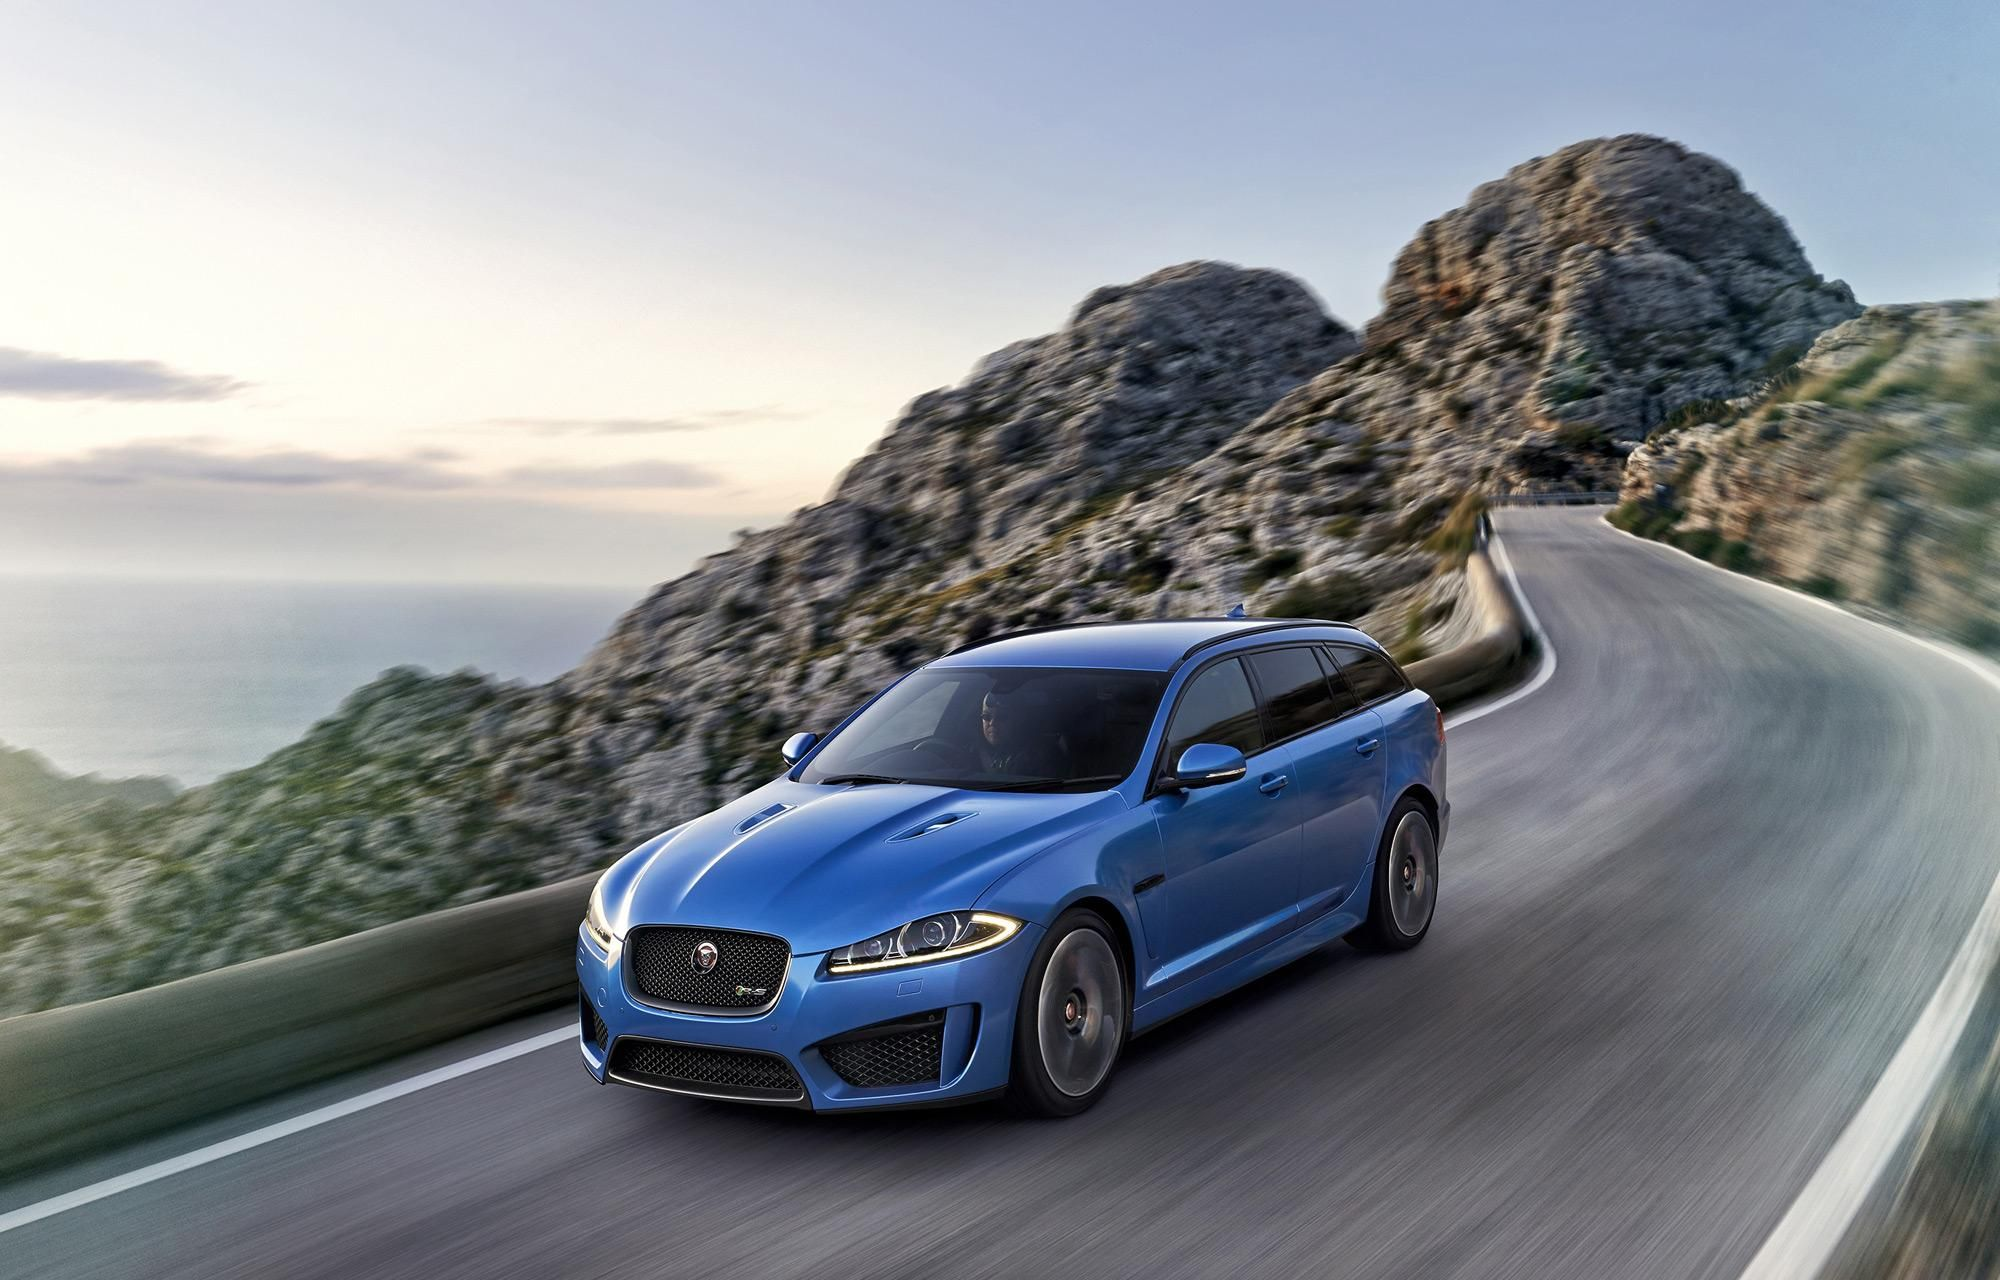 2015 Jaguar Xfr S Sportbrake Jaguar Xf Jaguar Geneva Motor Show